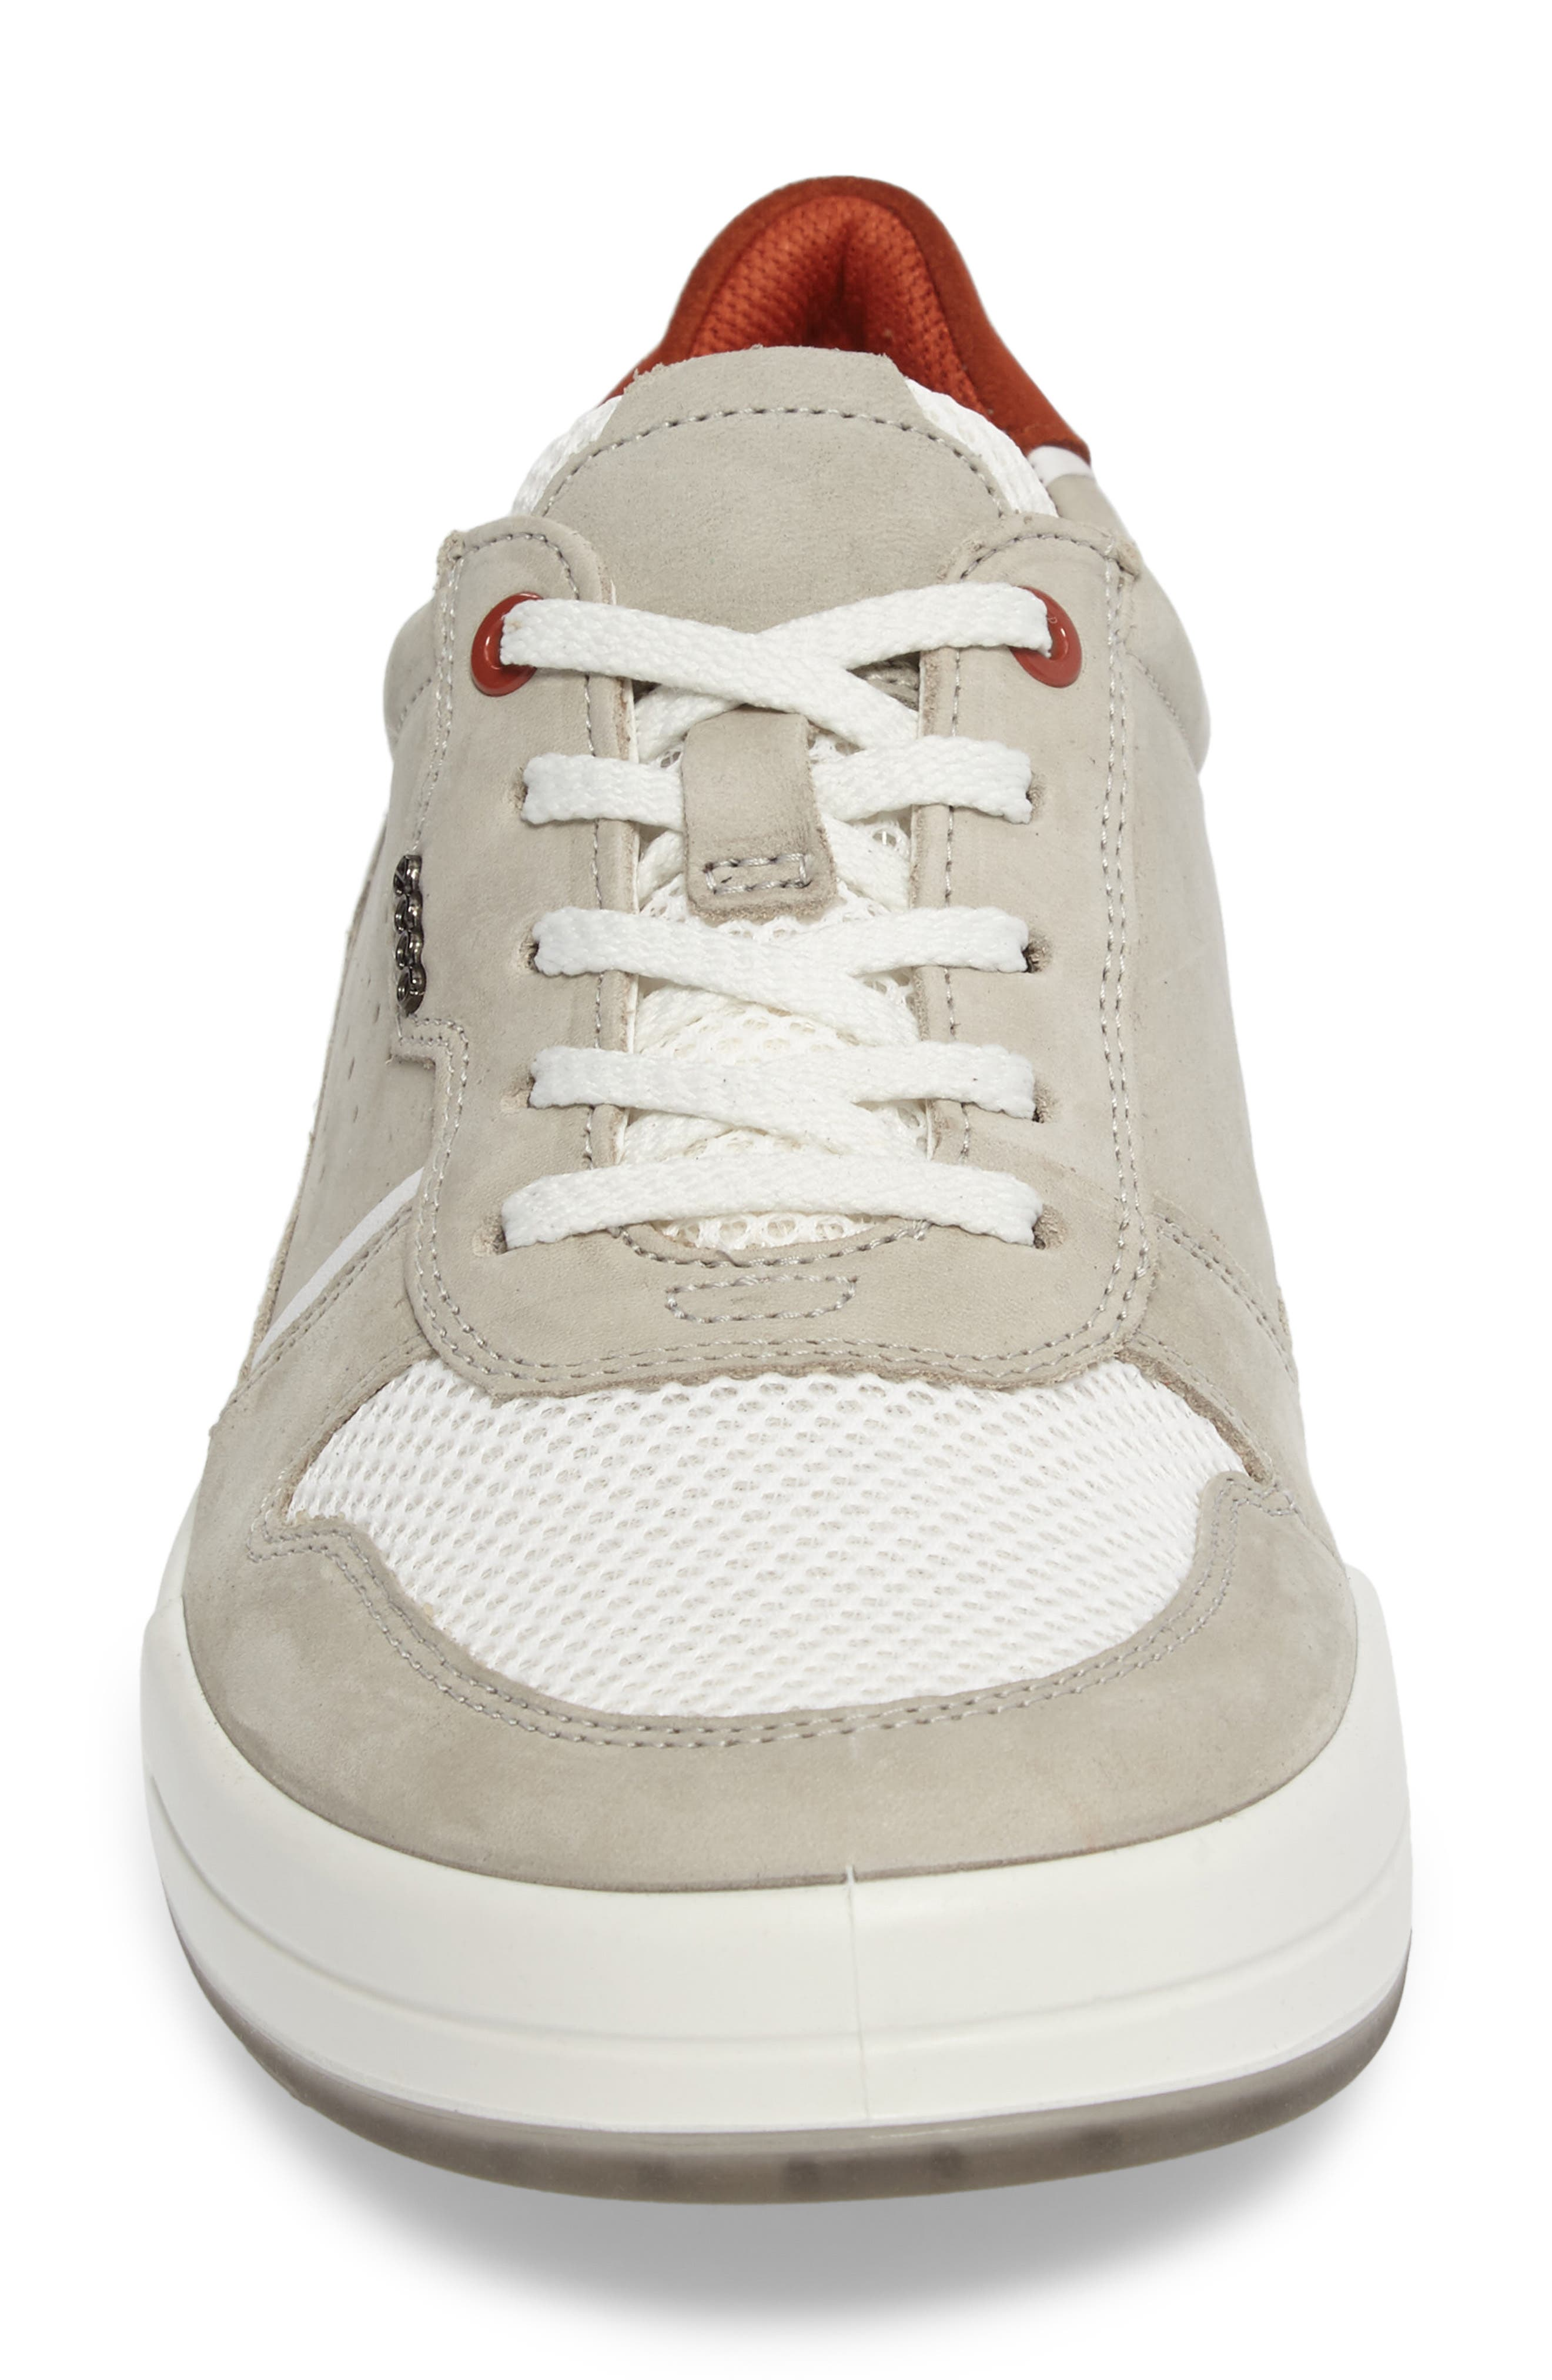 Jack Sneaker,                             Alternate thumbnail 4, color,                             053